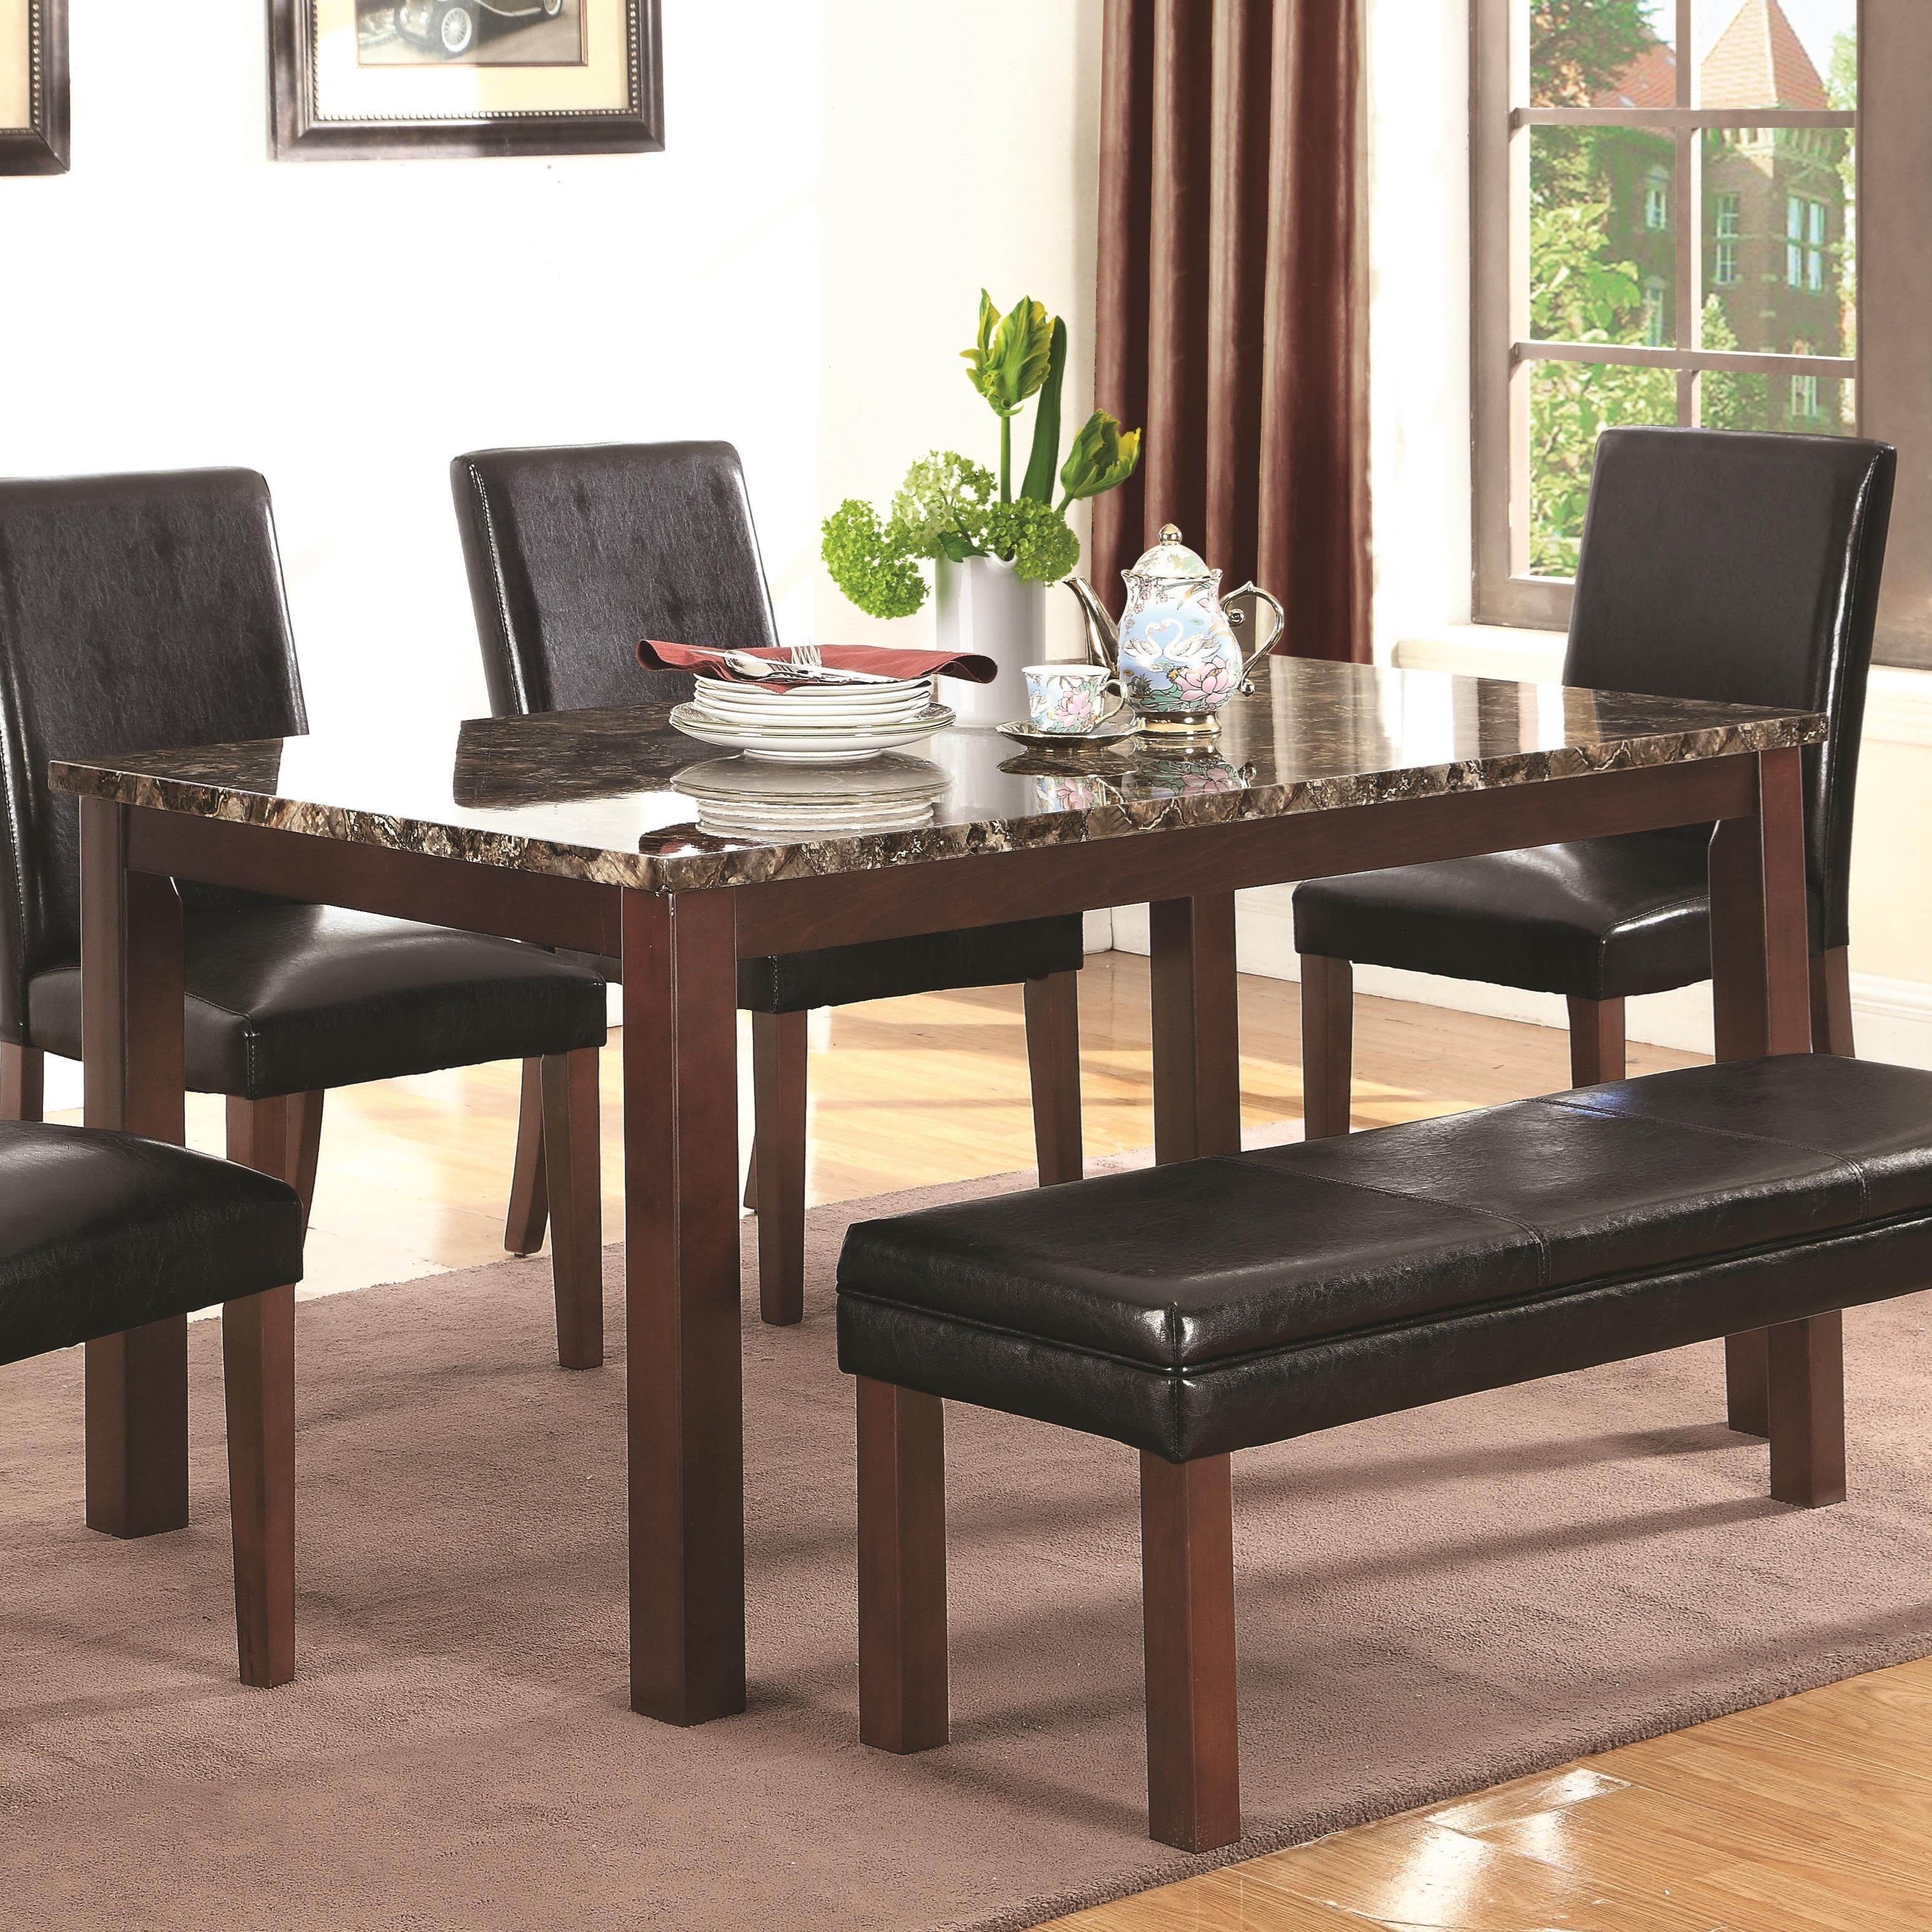 Coaster Otero Otero Dining Table - Item Number: 107701